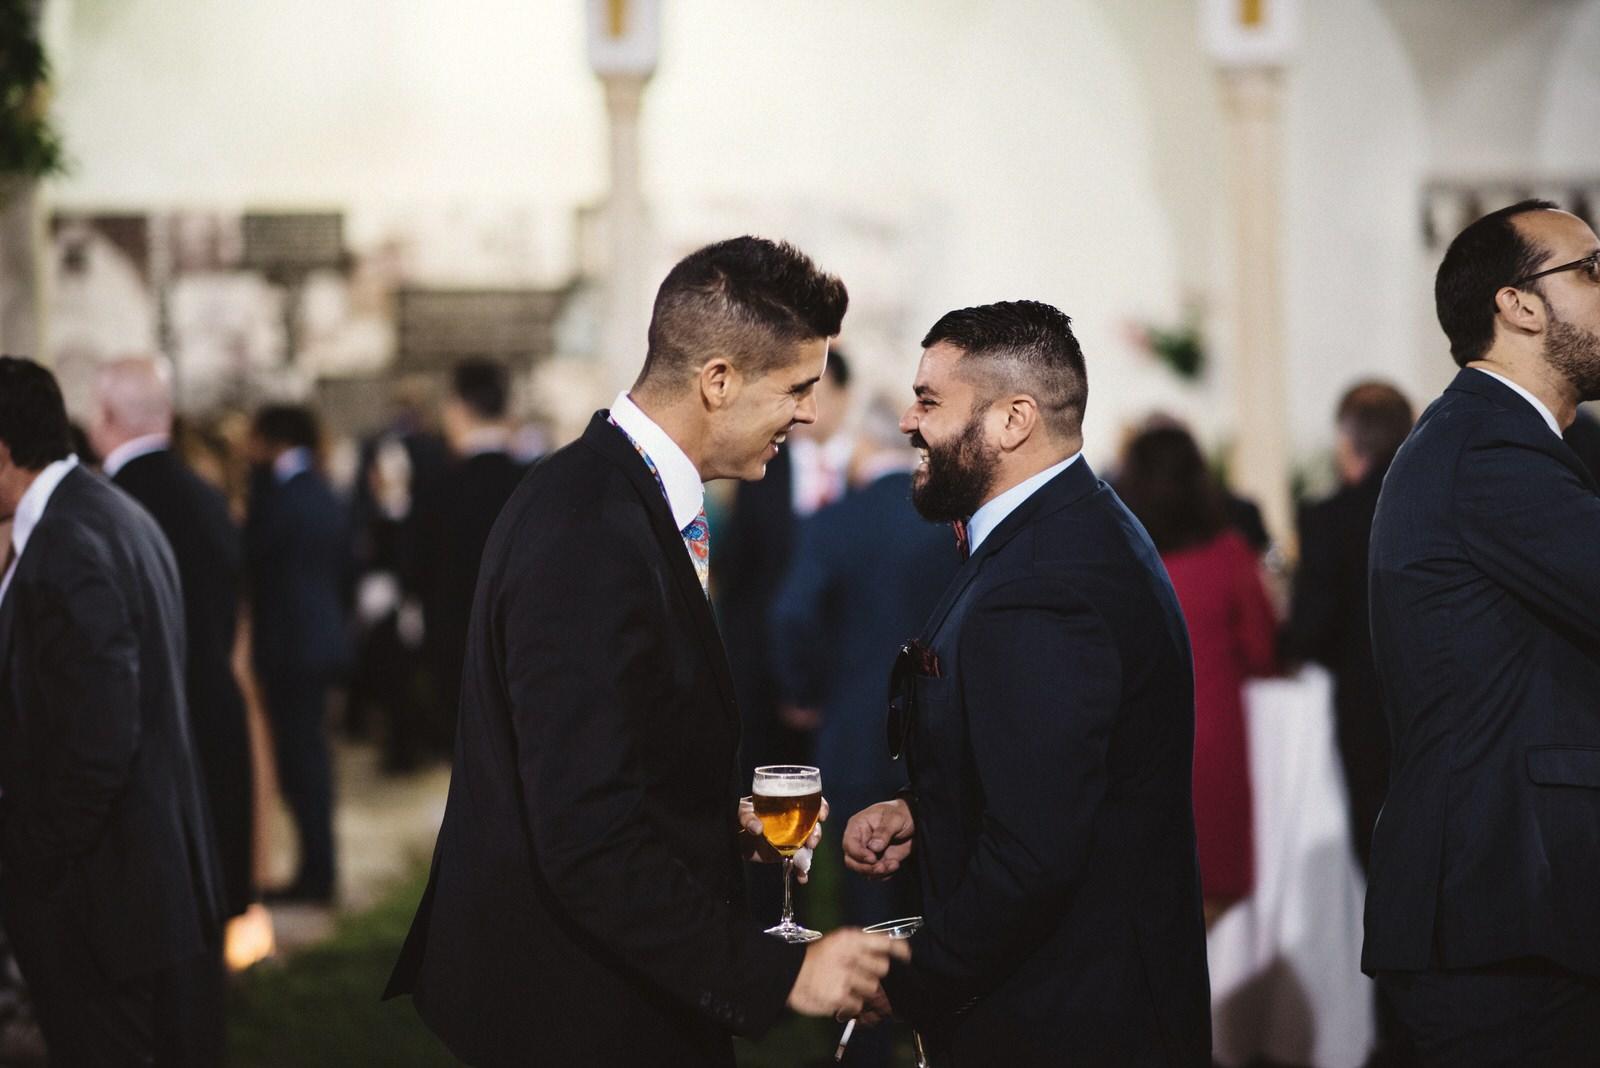 fotografo de bodas sevilla - fotografo boda - fotografía sevilla - Andrés AmarilloAAA_5338- tele- fine.JPG